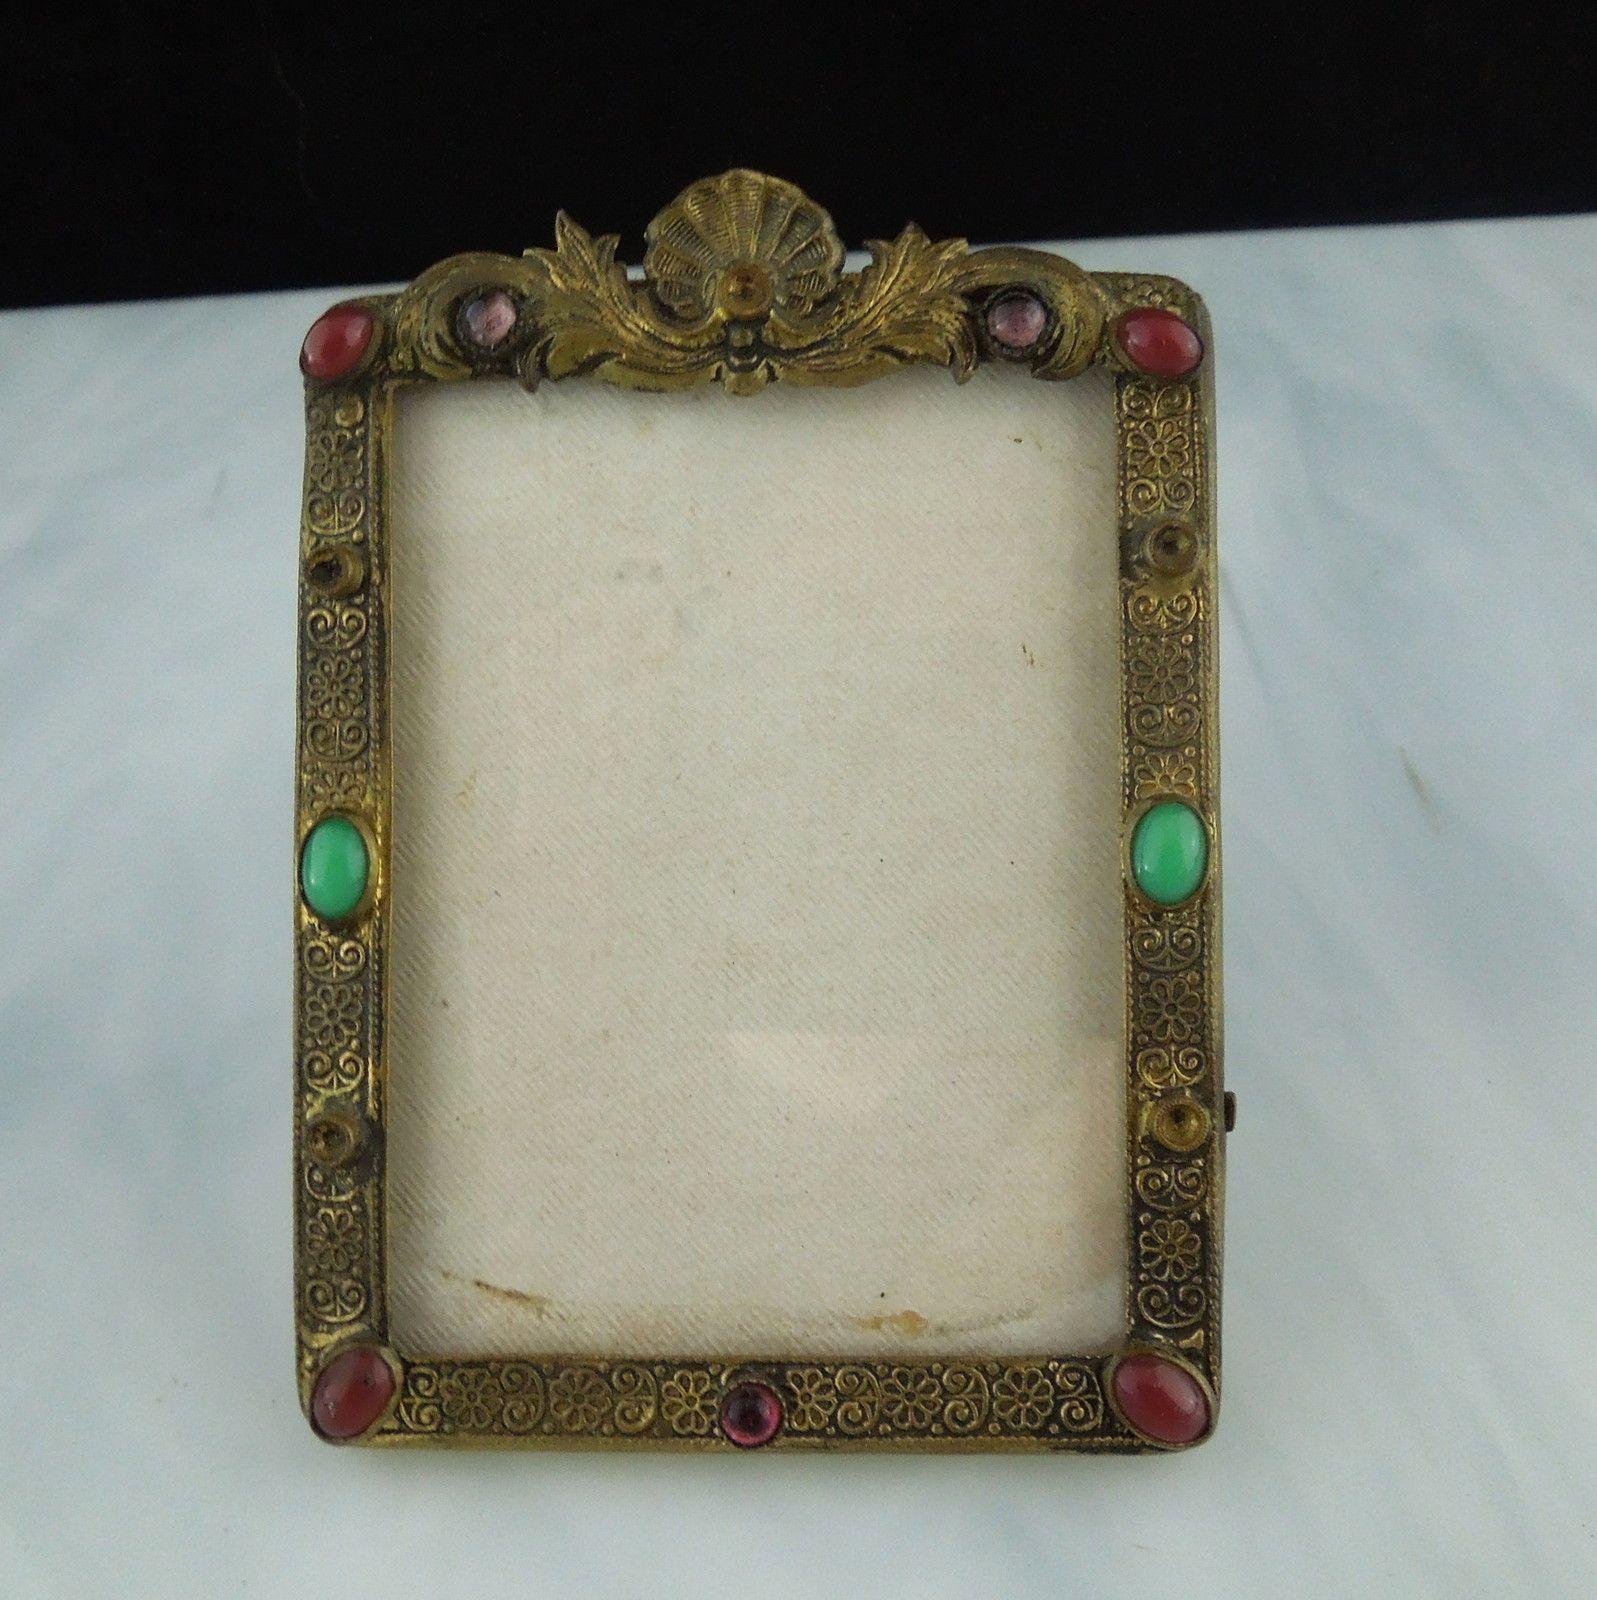 Ornate Vintage Czech Glass Faux Jeweled Mini Miniature Picture Frame ...